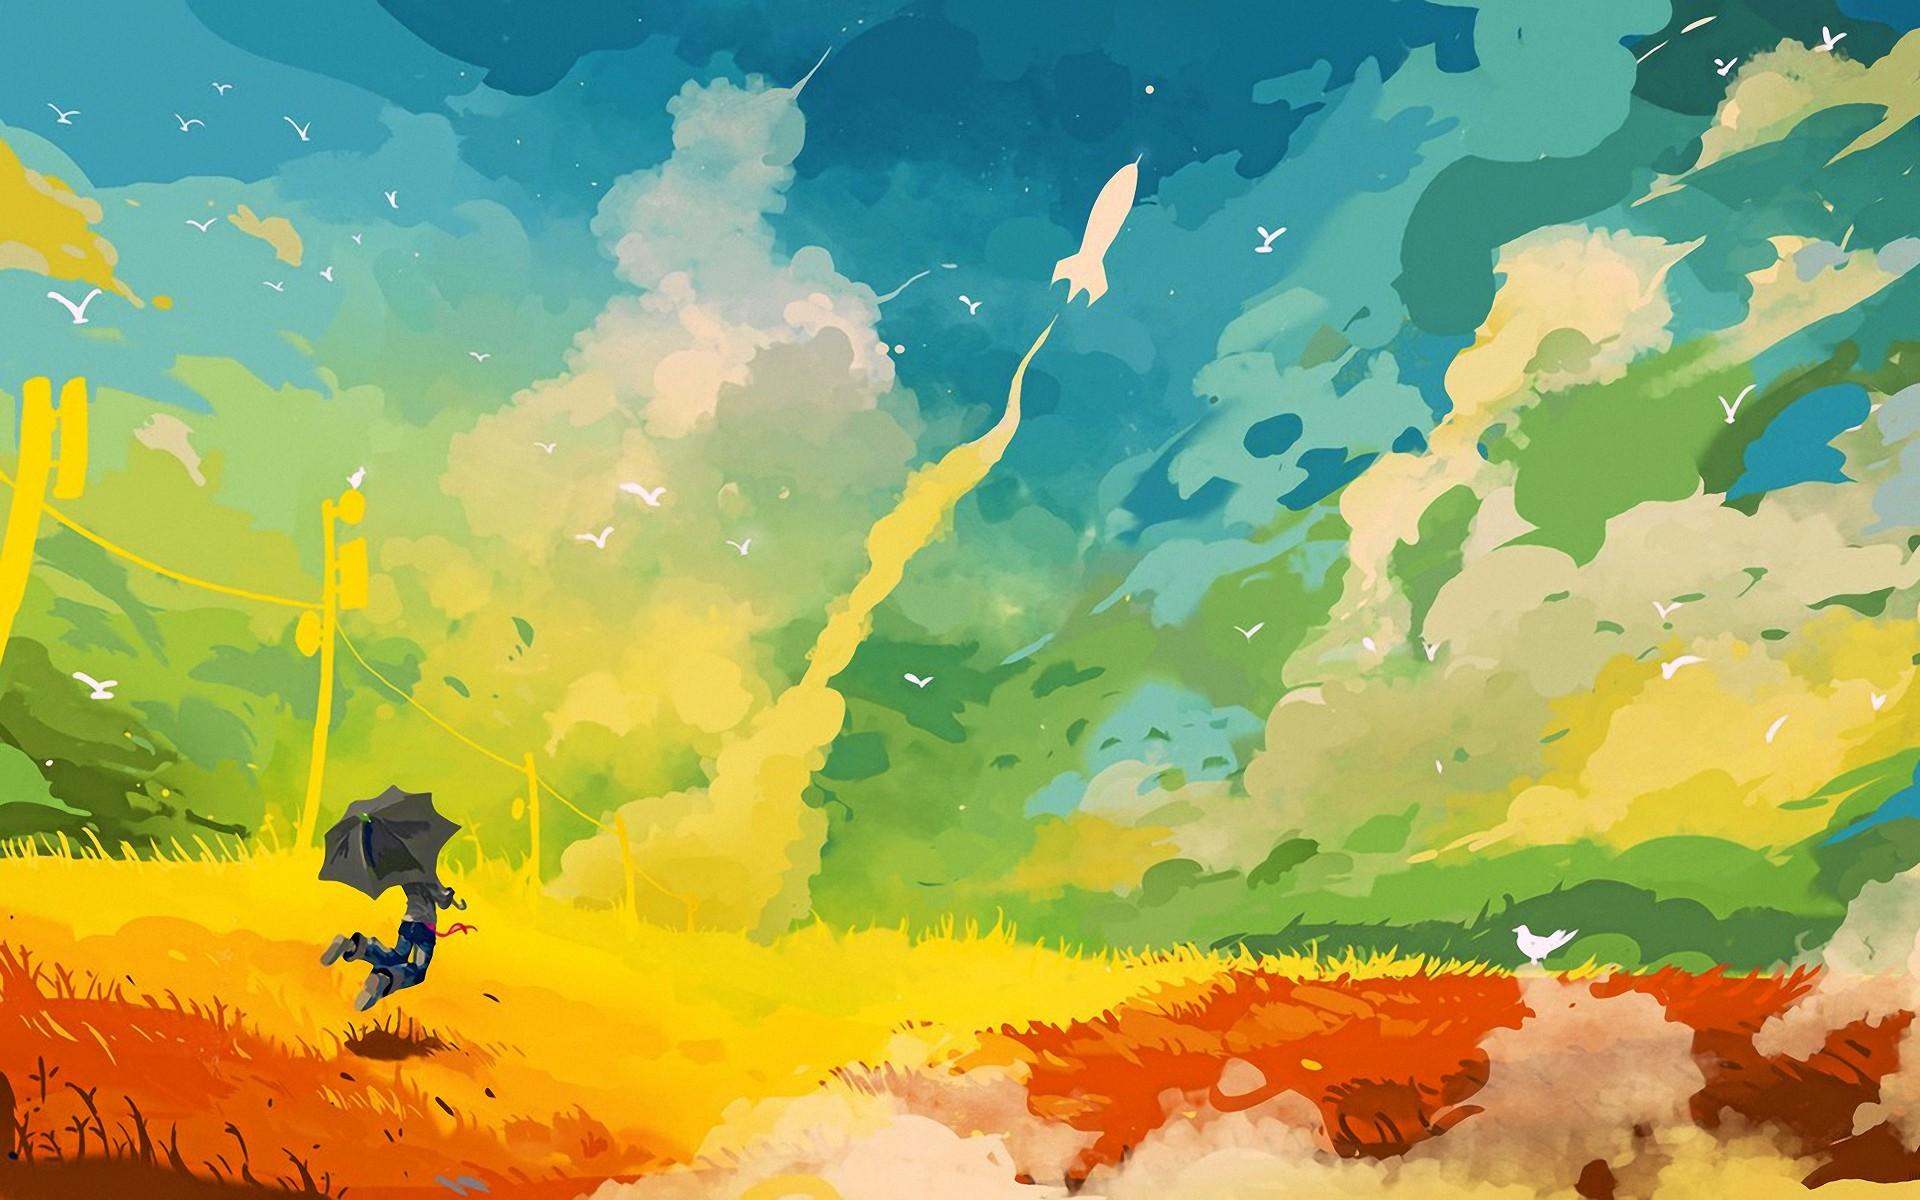 Art fondos de pantalla Resumen multicolor Digital Art fotos gratis 1920x1200